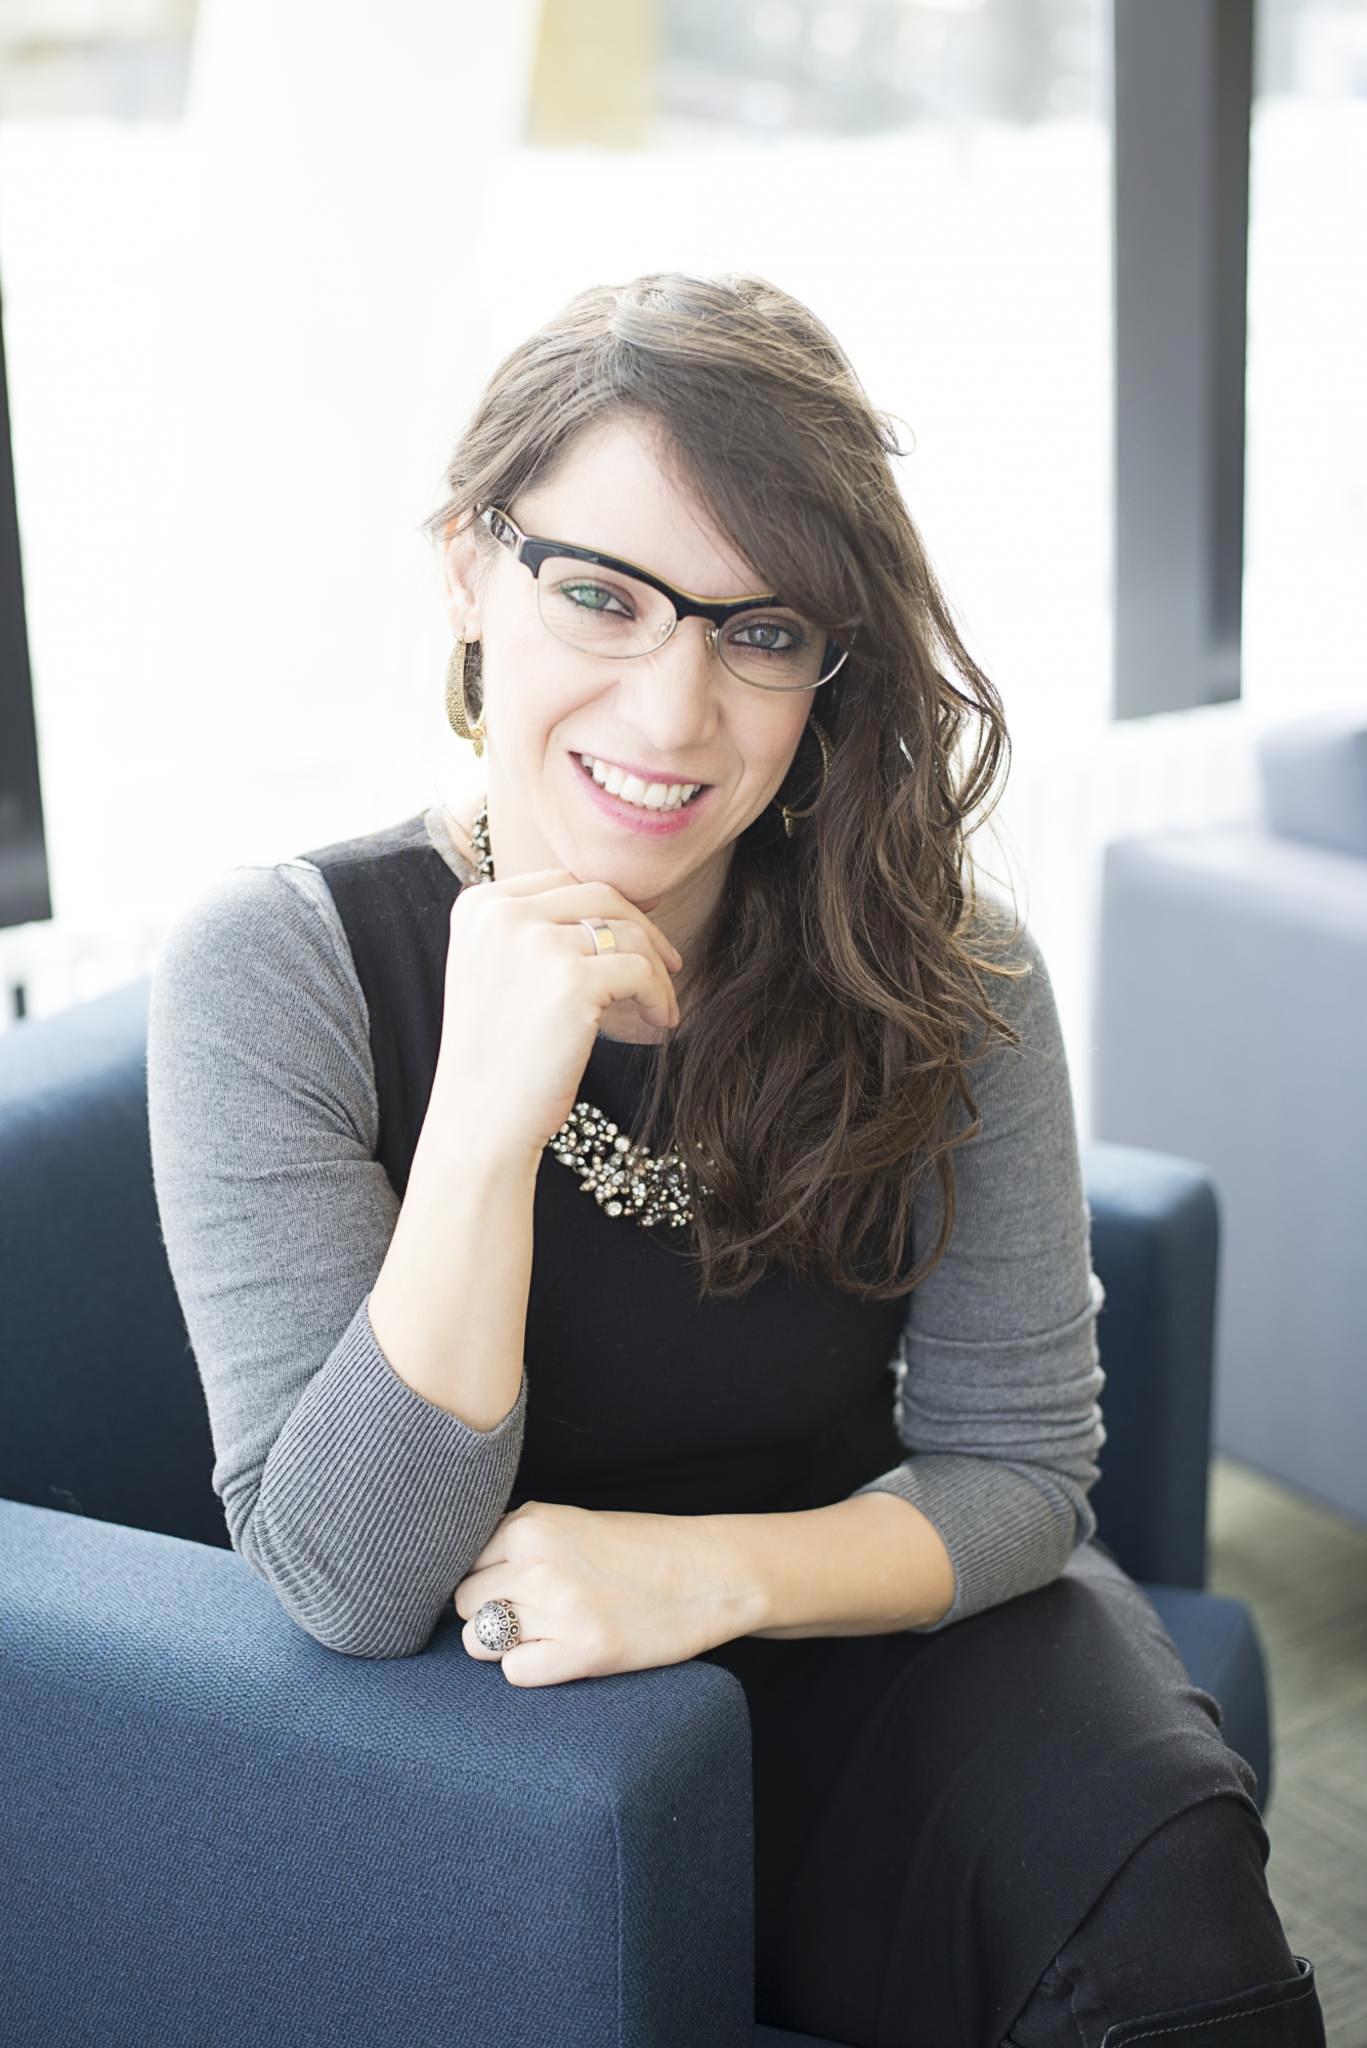 Erica Investment Analyst - Economics Researcher